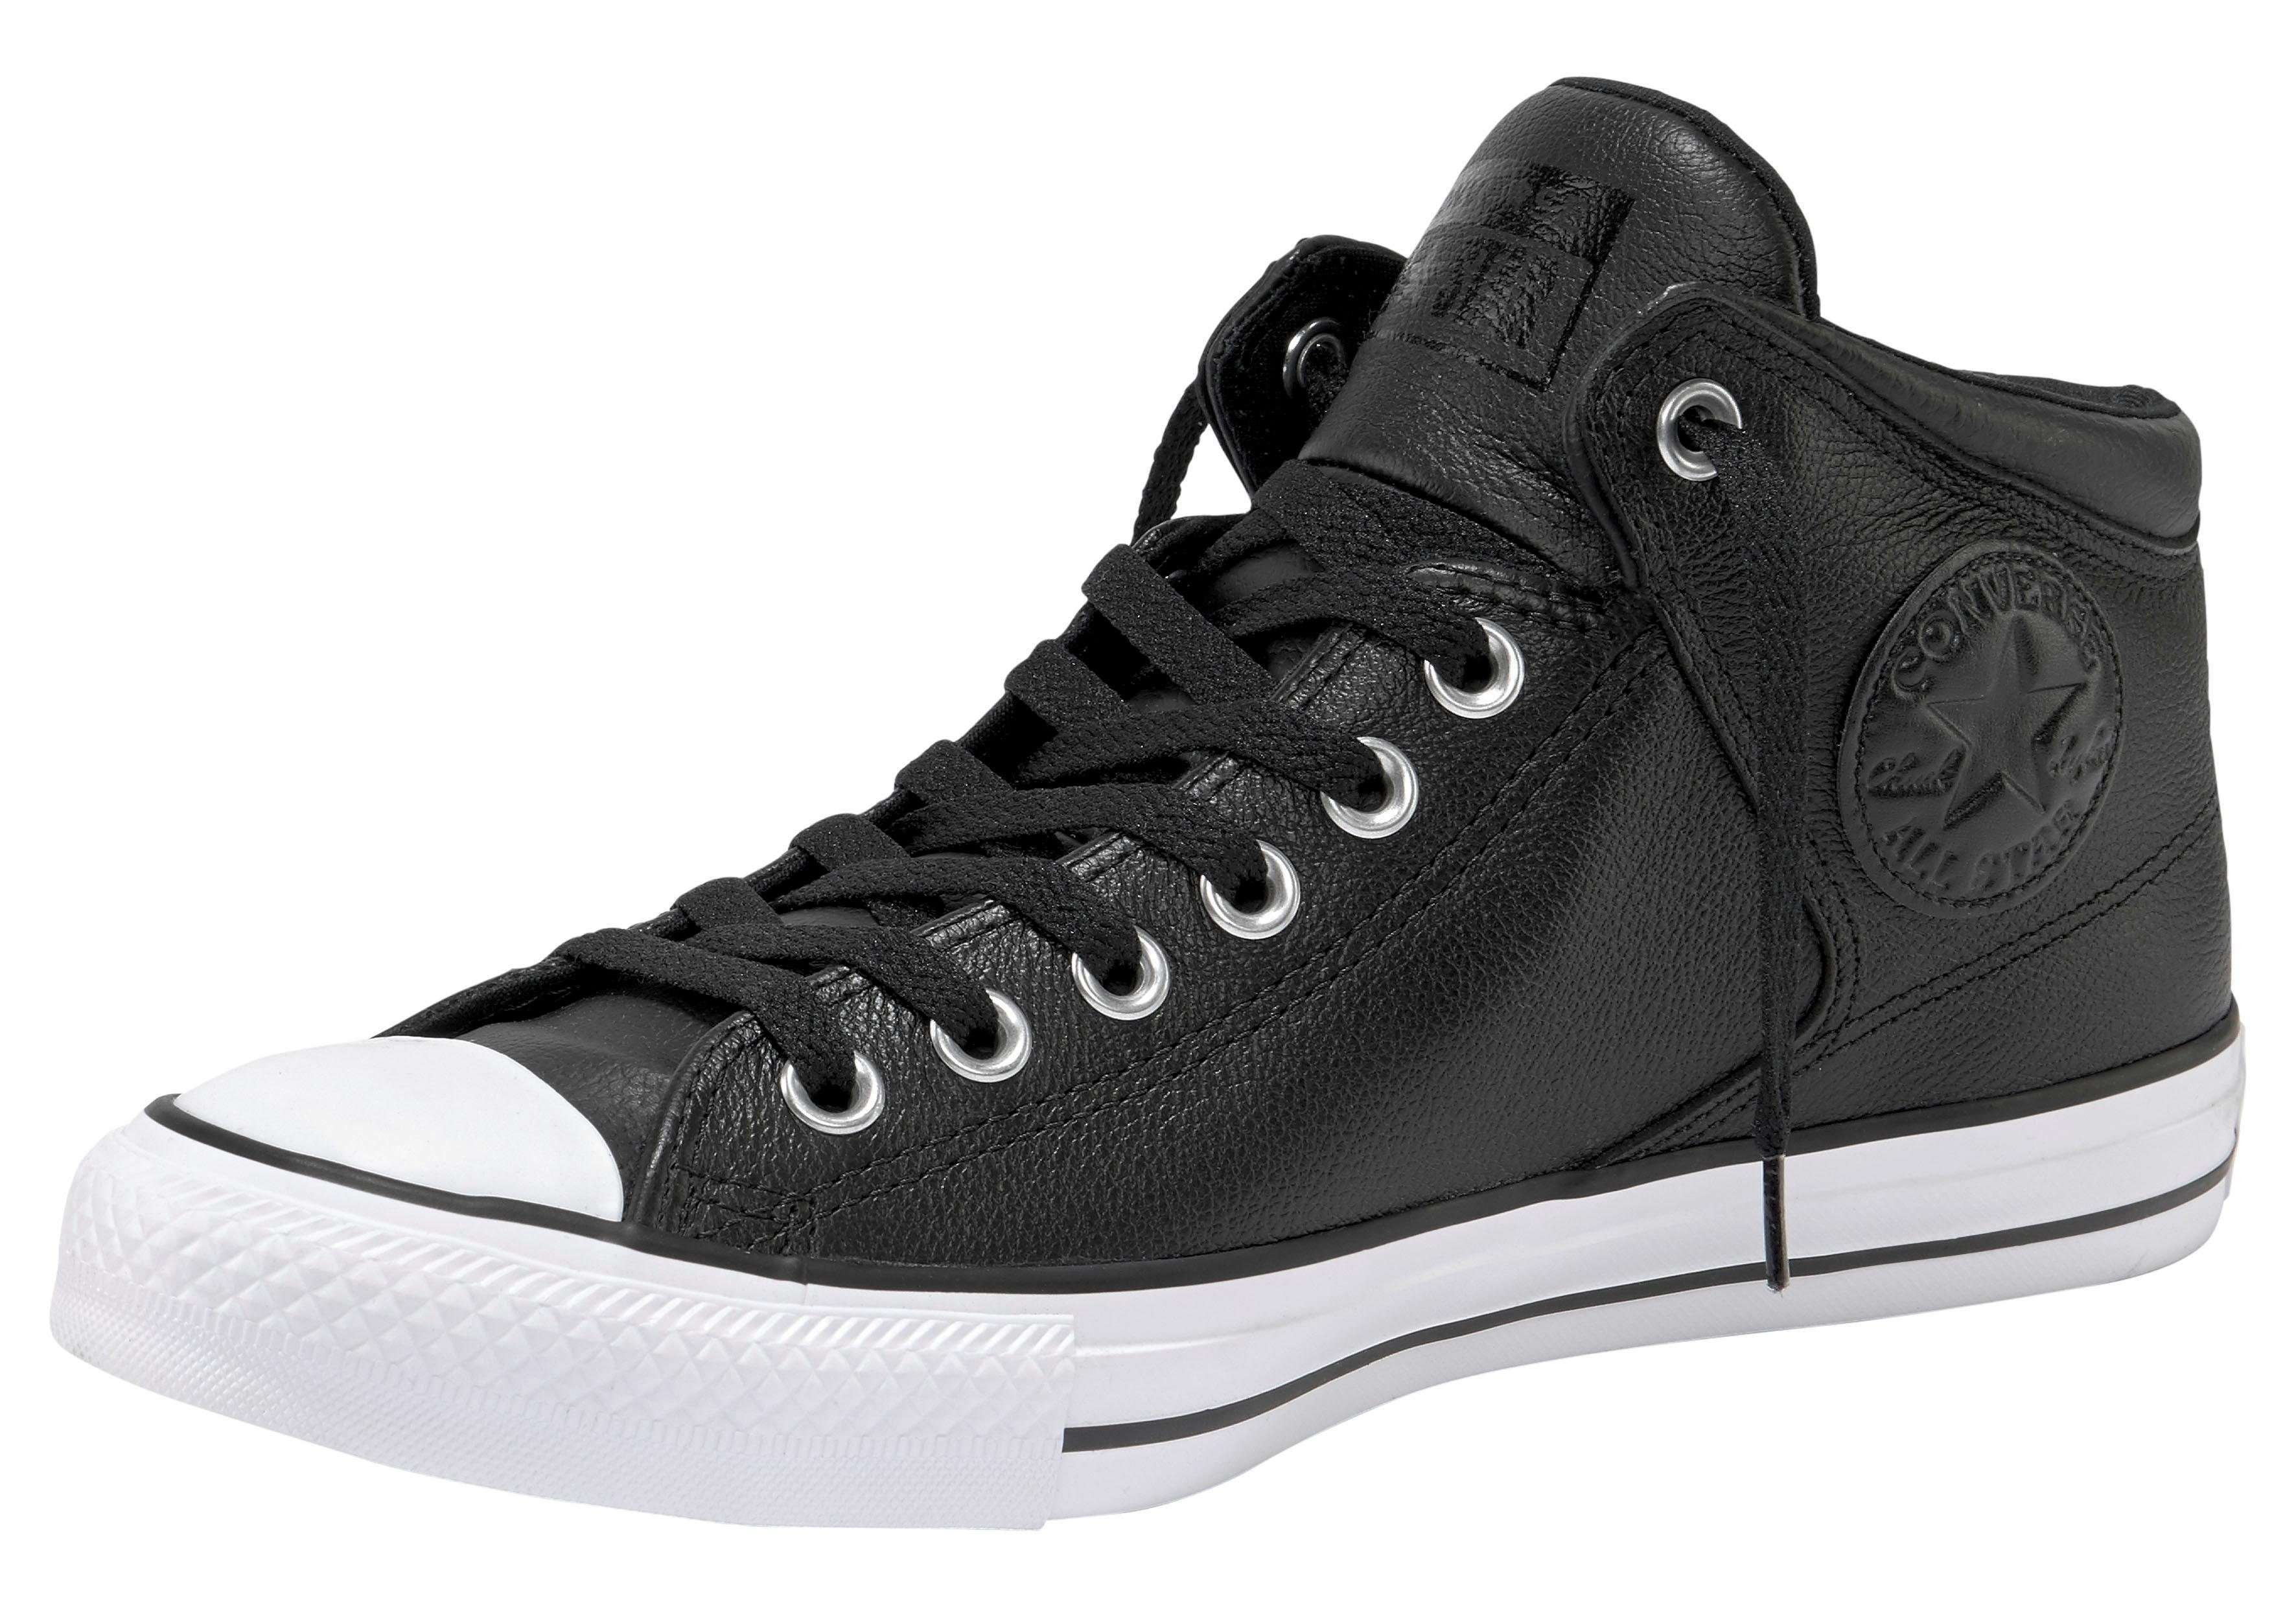 Converse »Chuck Taylor All Star High Street Hi« Sneaker, Weiches Obermaterial aus Leder online kaufen   OTTO